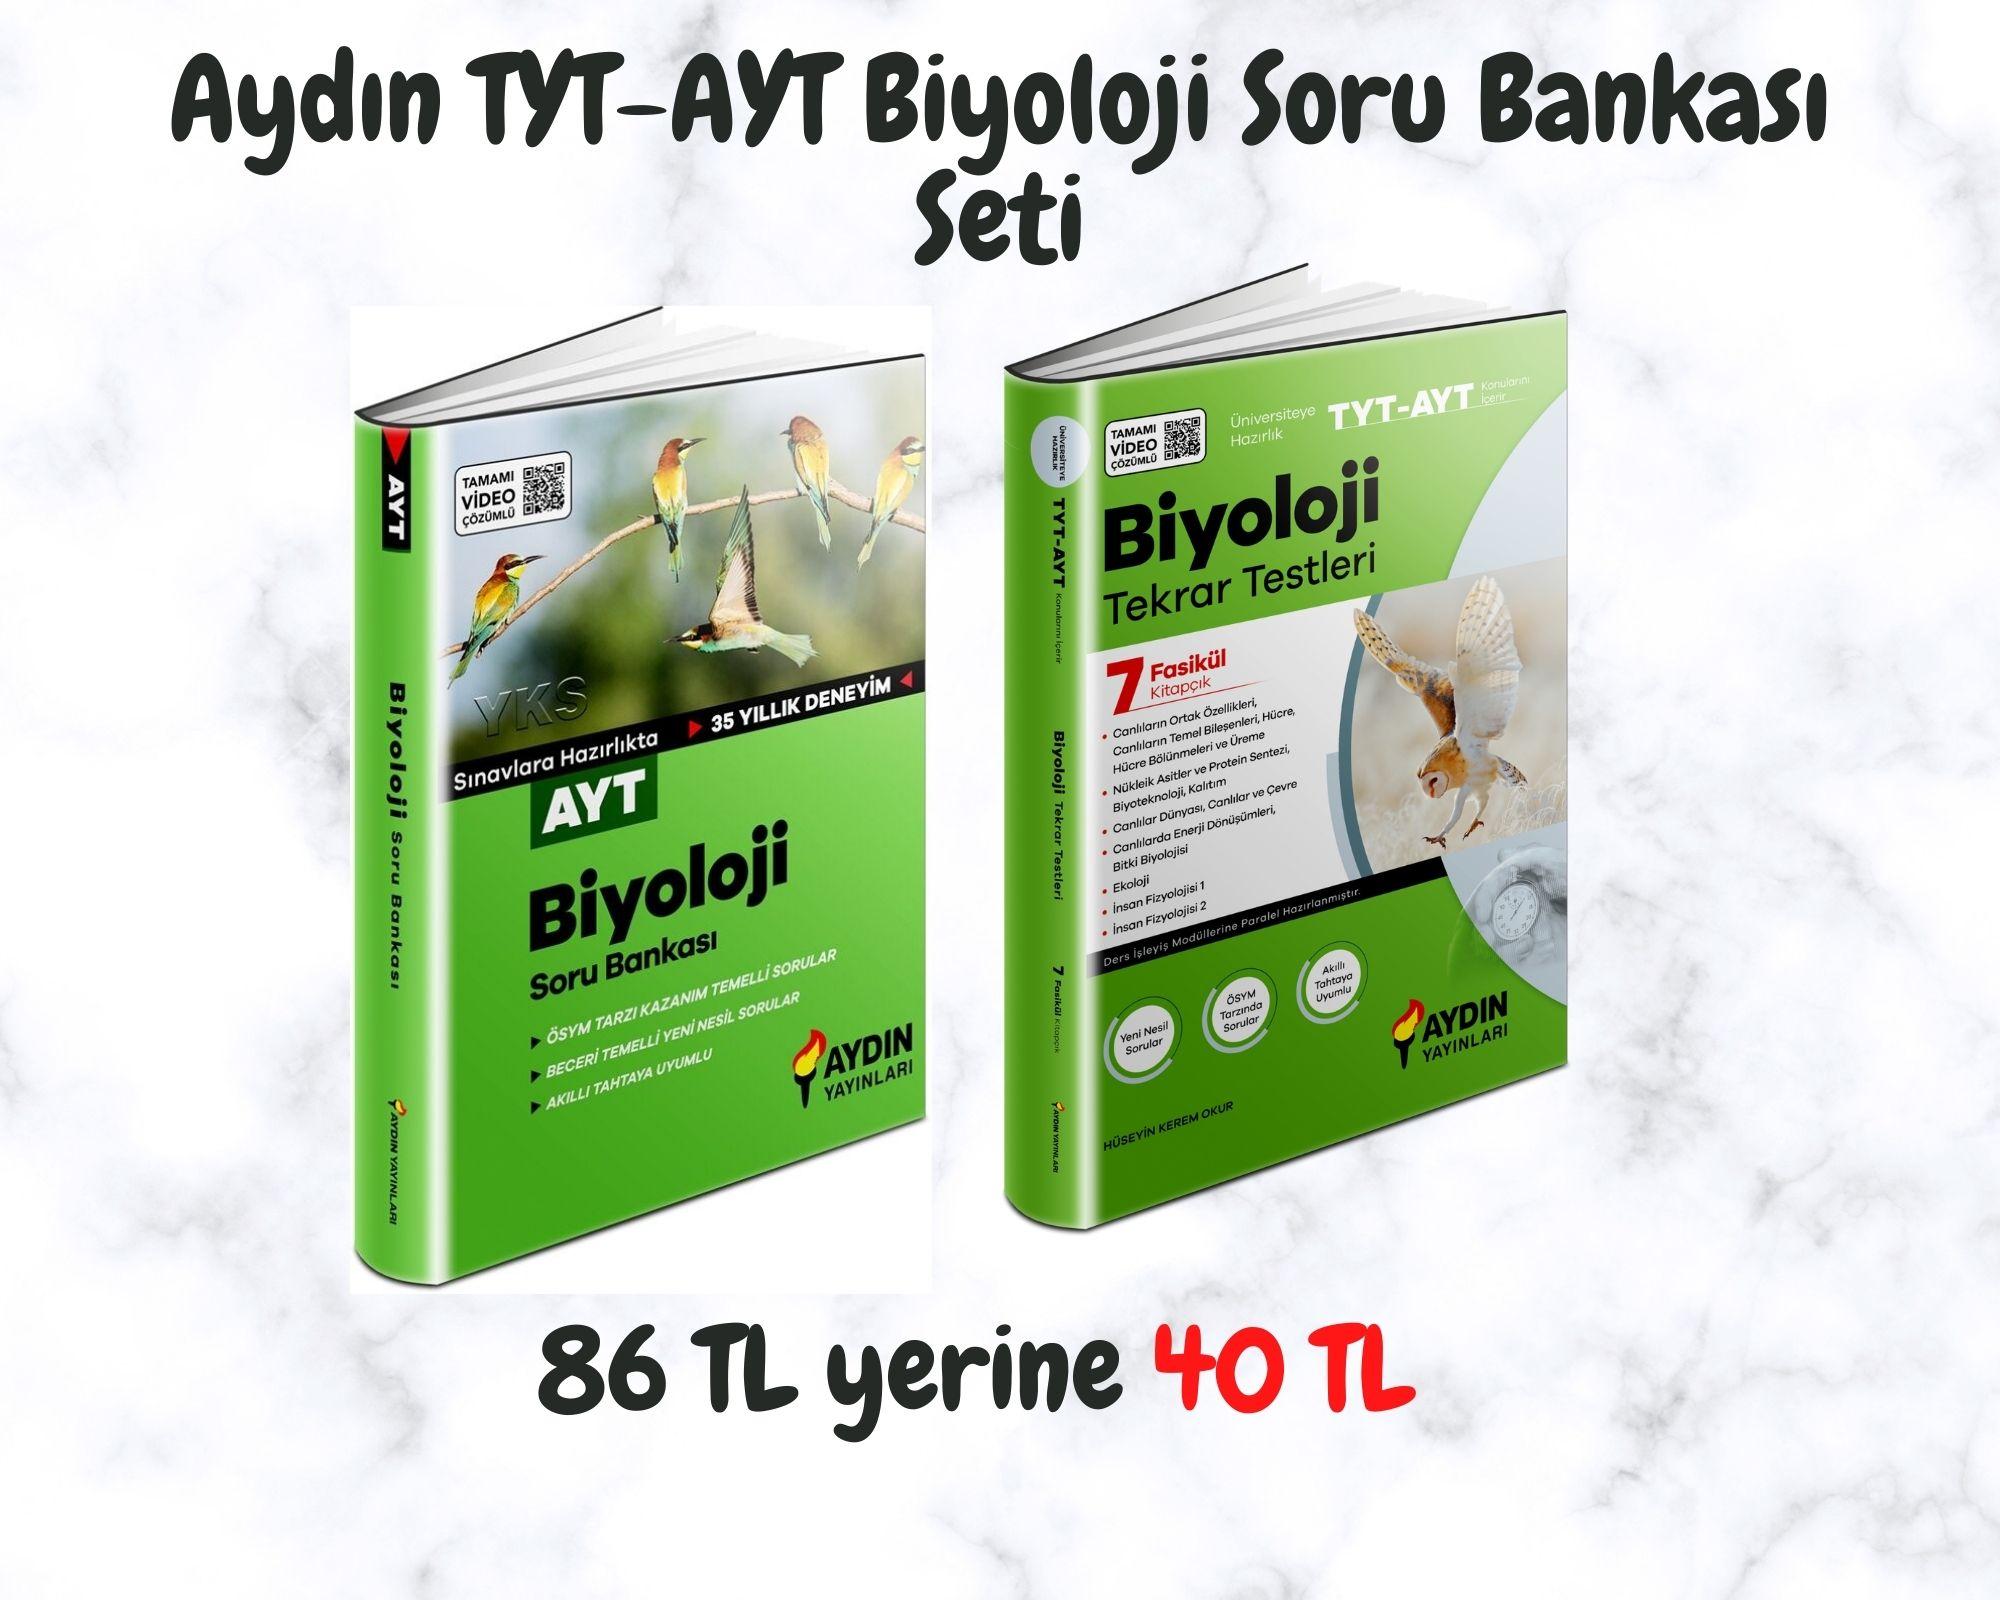 Aydın TYT-AYT Biyoloji Soru Bankası Seti